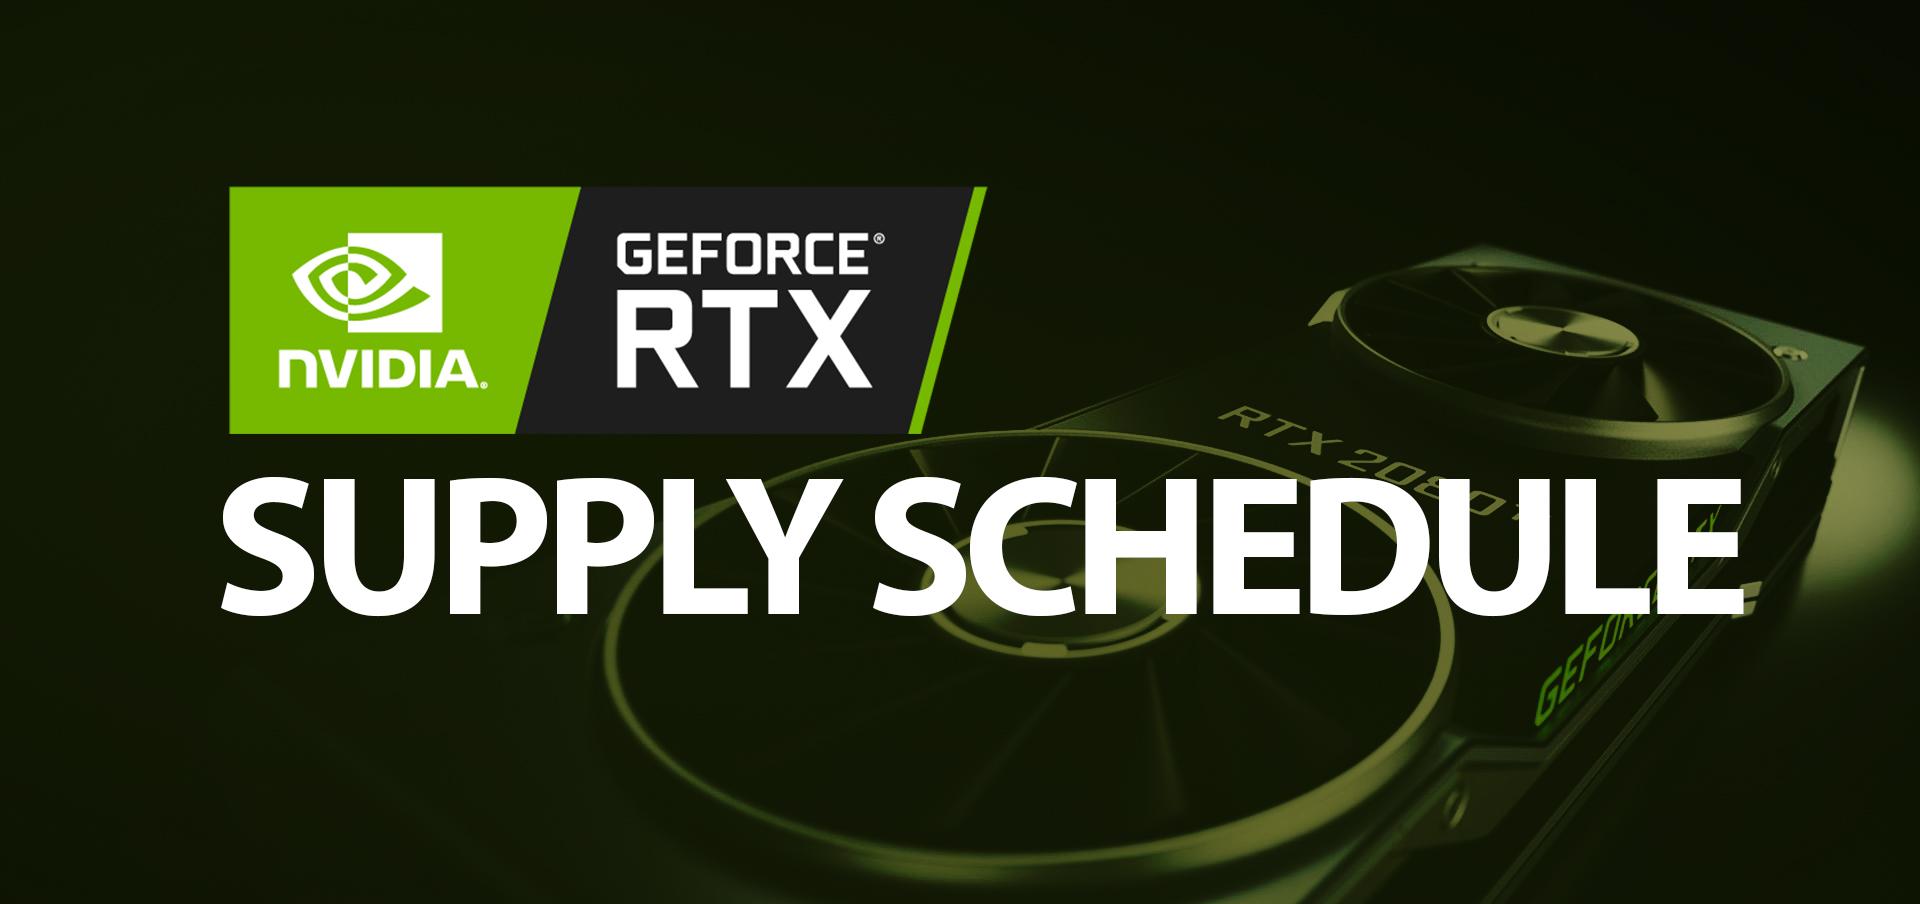 NVIDIA's GeForce RTX 2080 Ti, RTX 2080 and RTX 2070 Supply